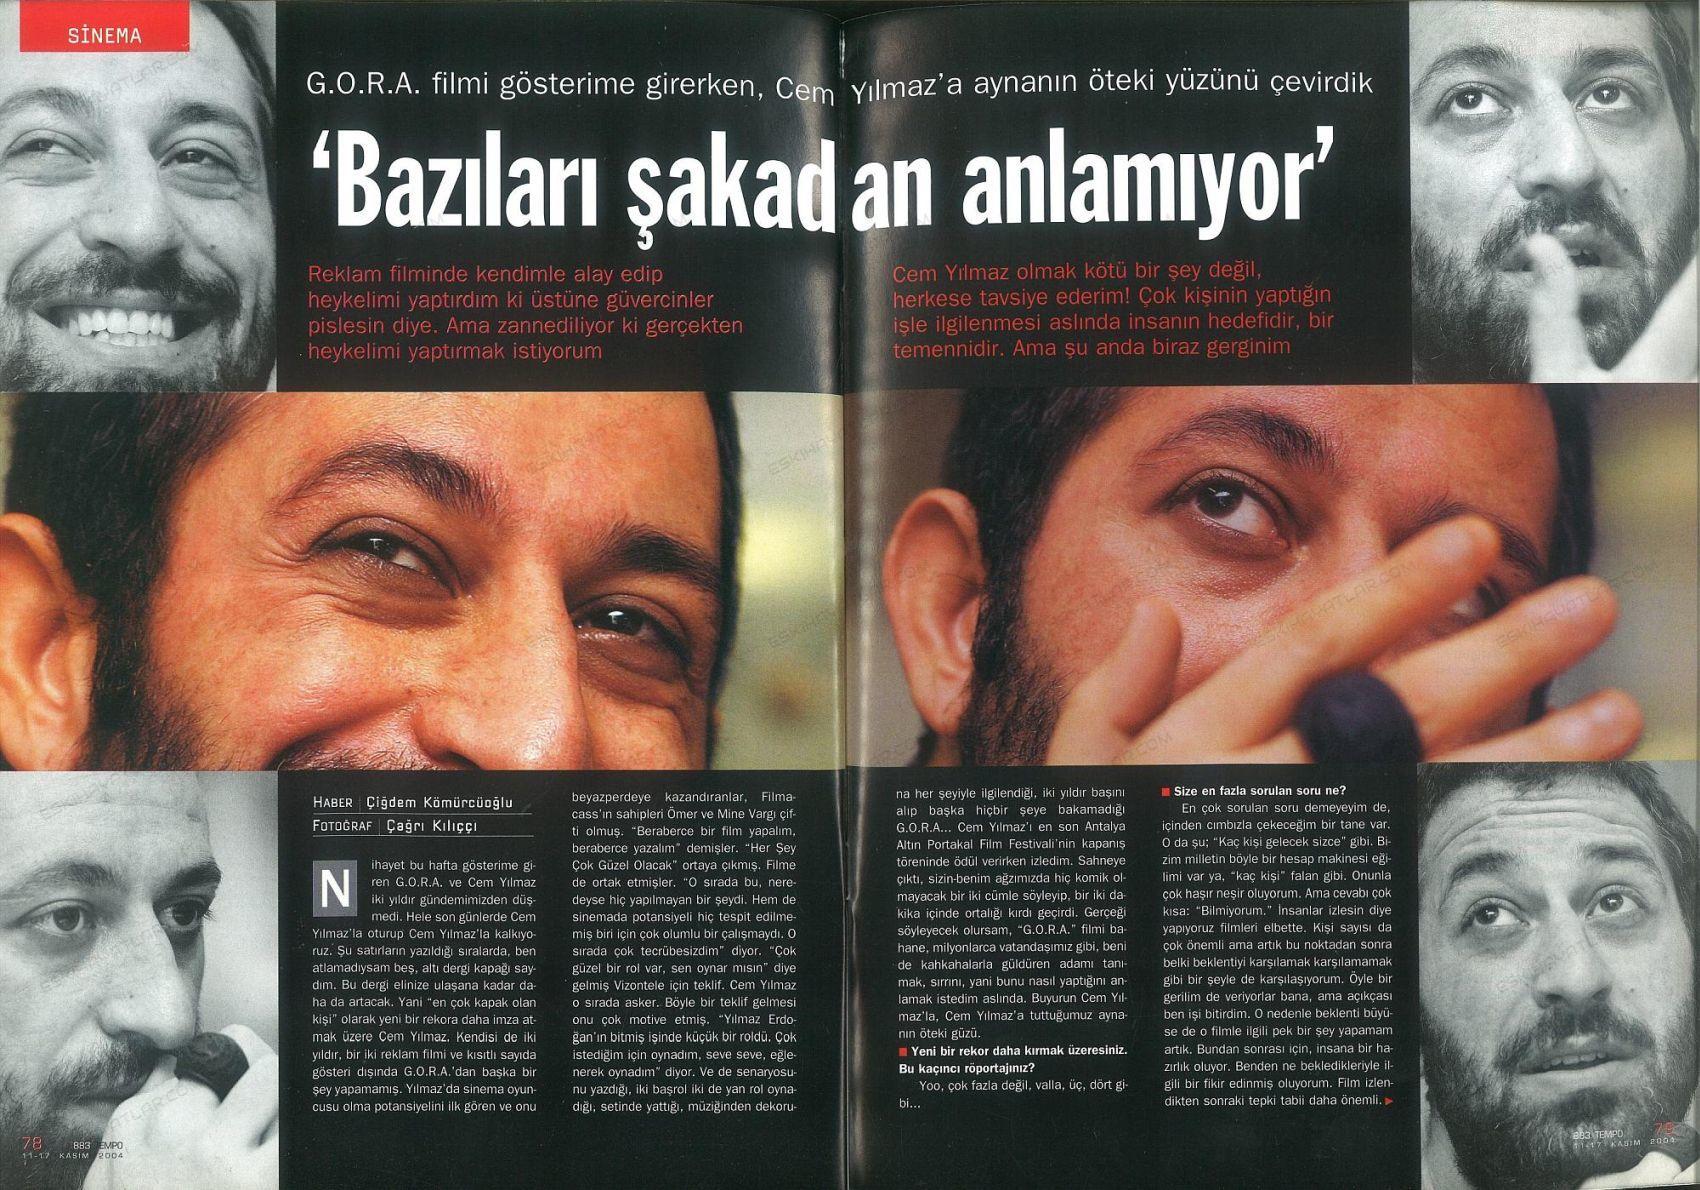 0215-gora-filmi-ne-zaman-cekildi-2004-tempo-dergisi-cem-yilmaz-roportaji (1)